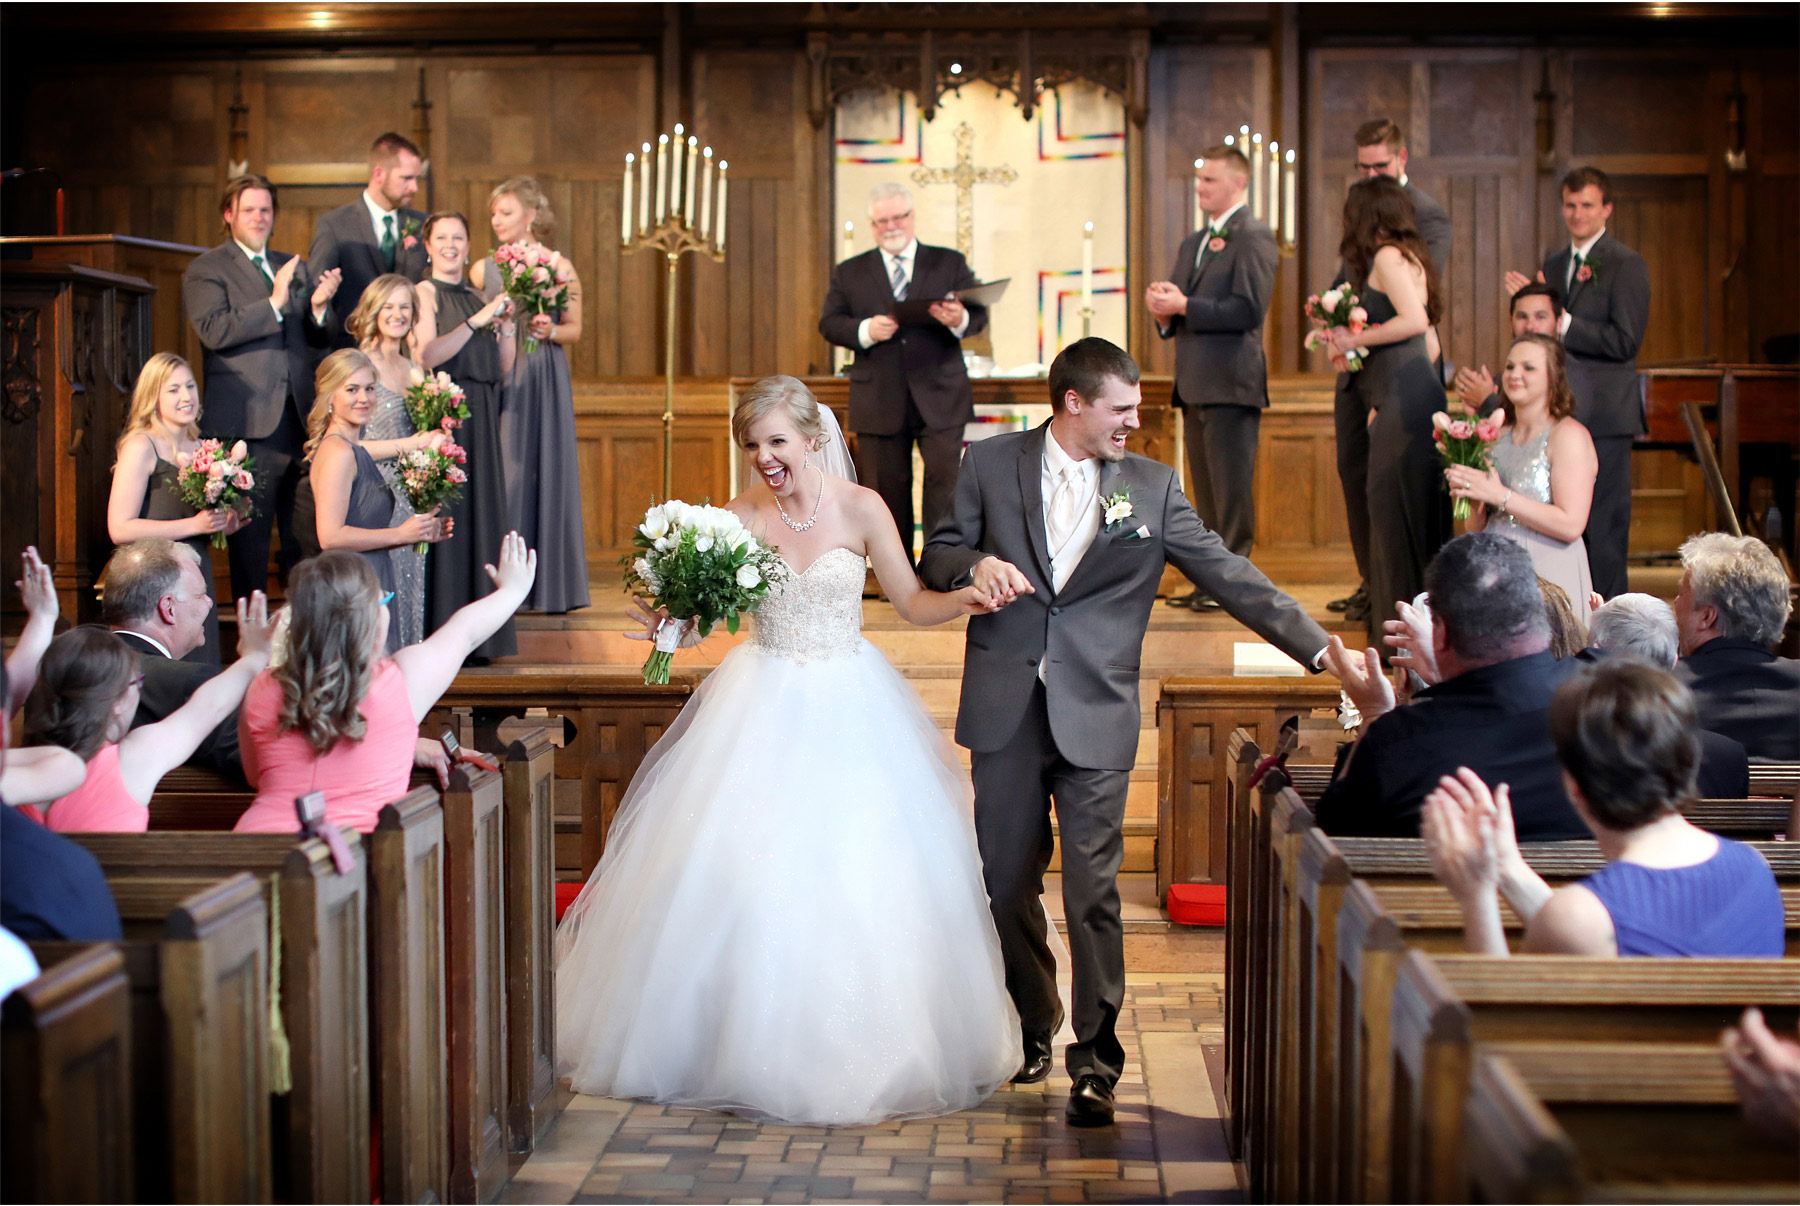 12-Minneapolis-Wedding-Photography-by-Vick-Photography-Hamline-Church-United-Methodist-Ceremony-Kasie-and-Joshua.jpg